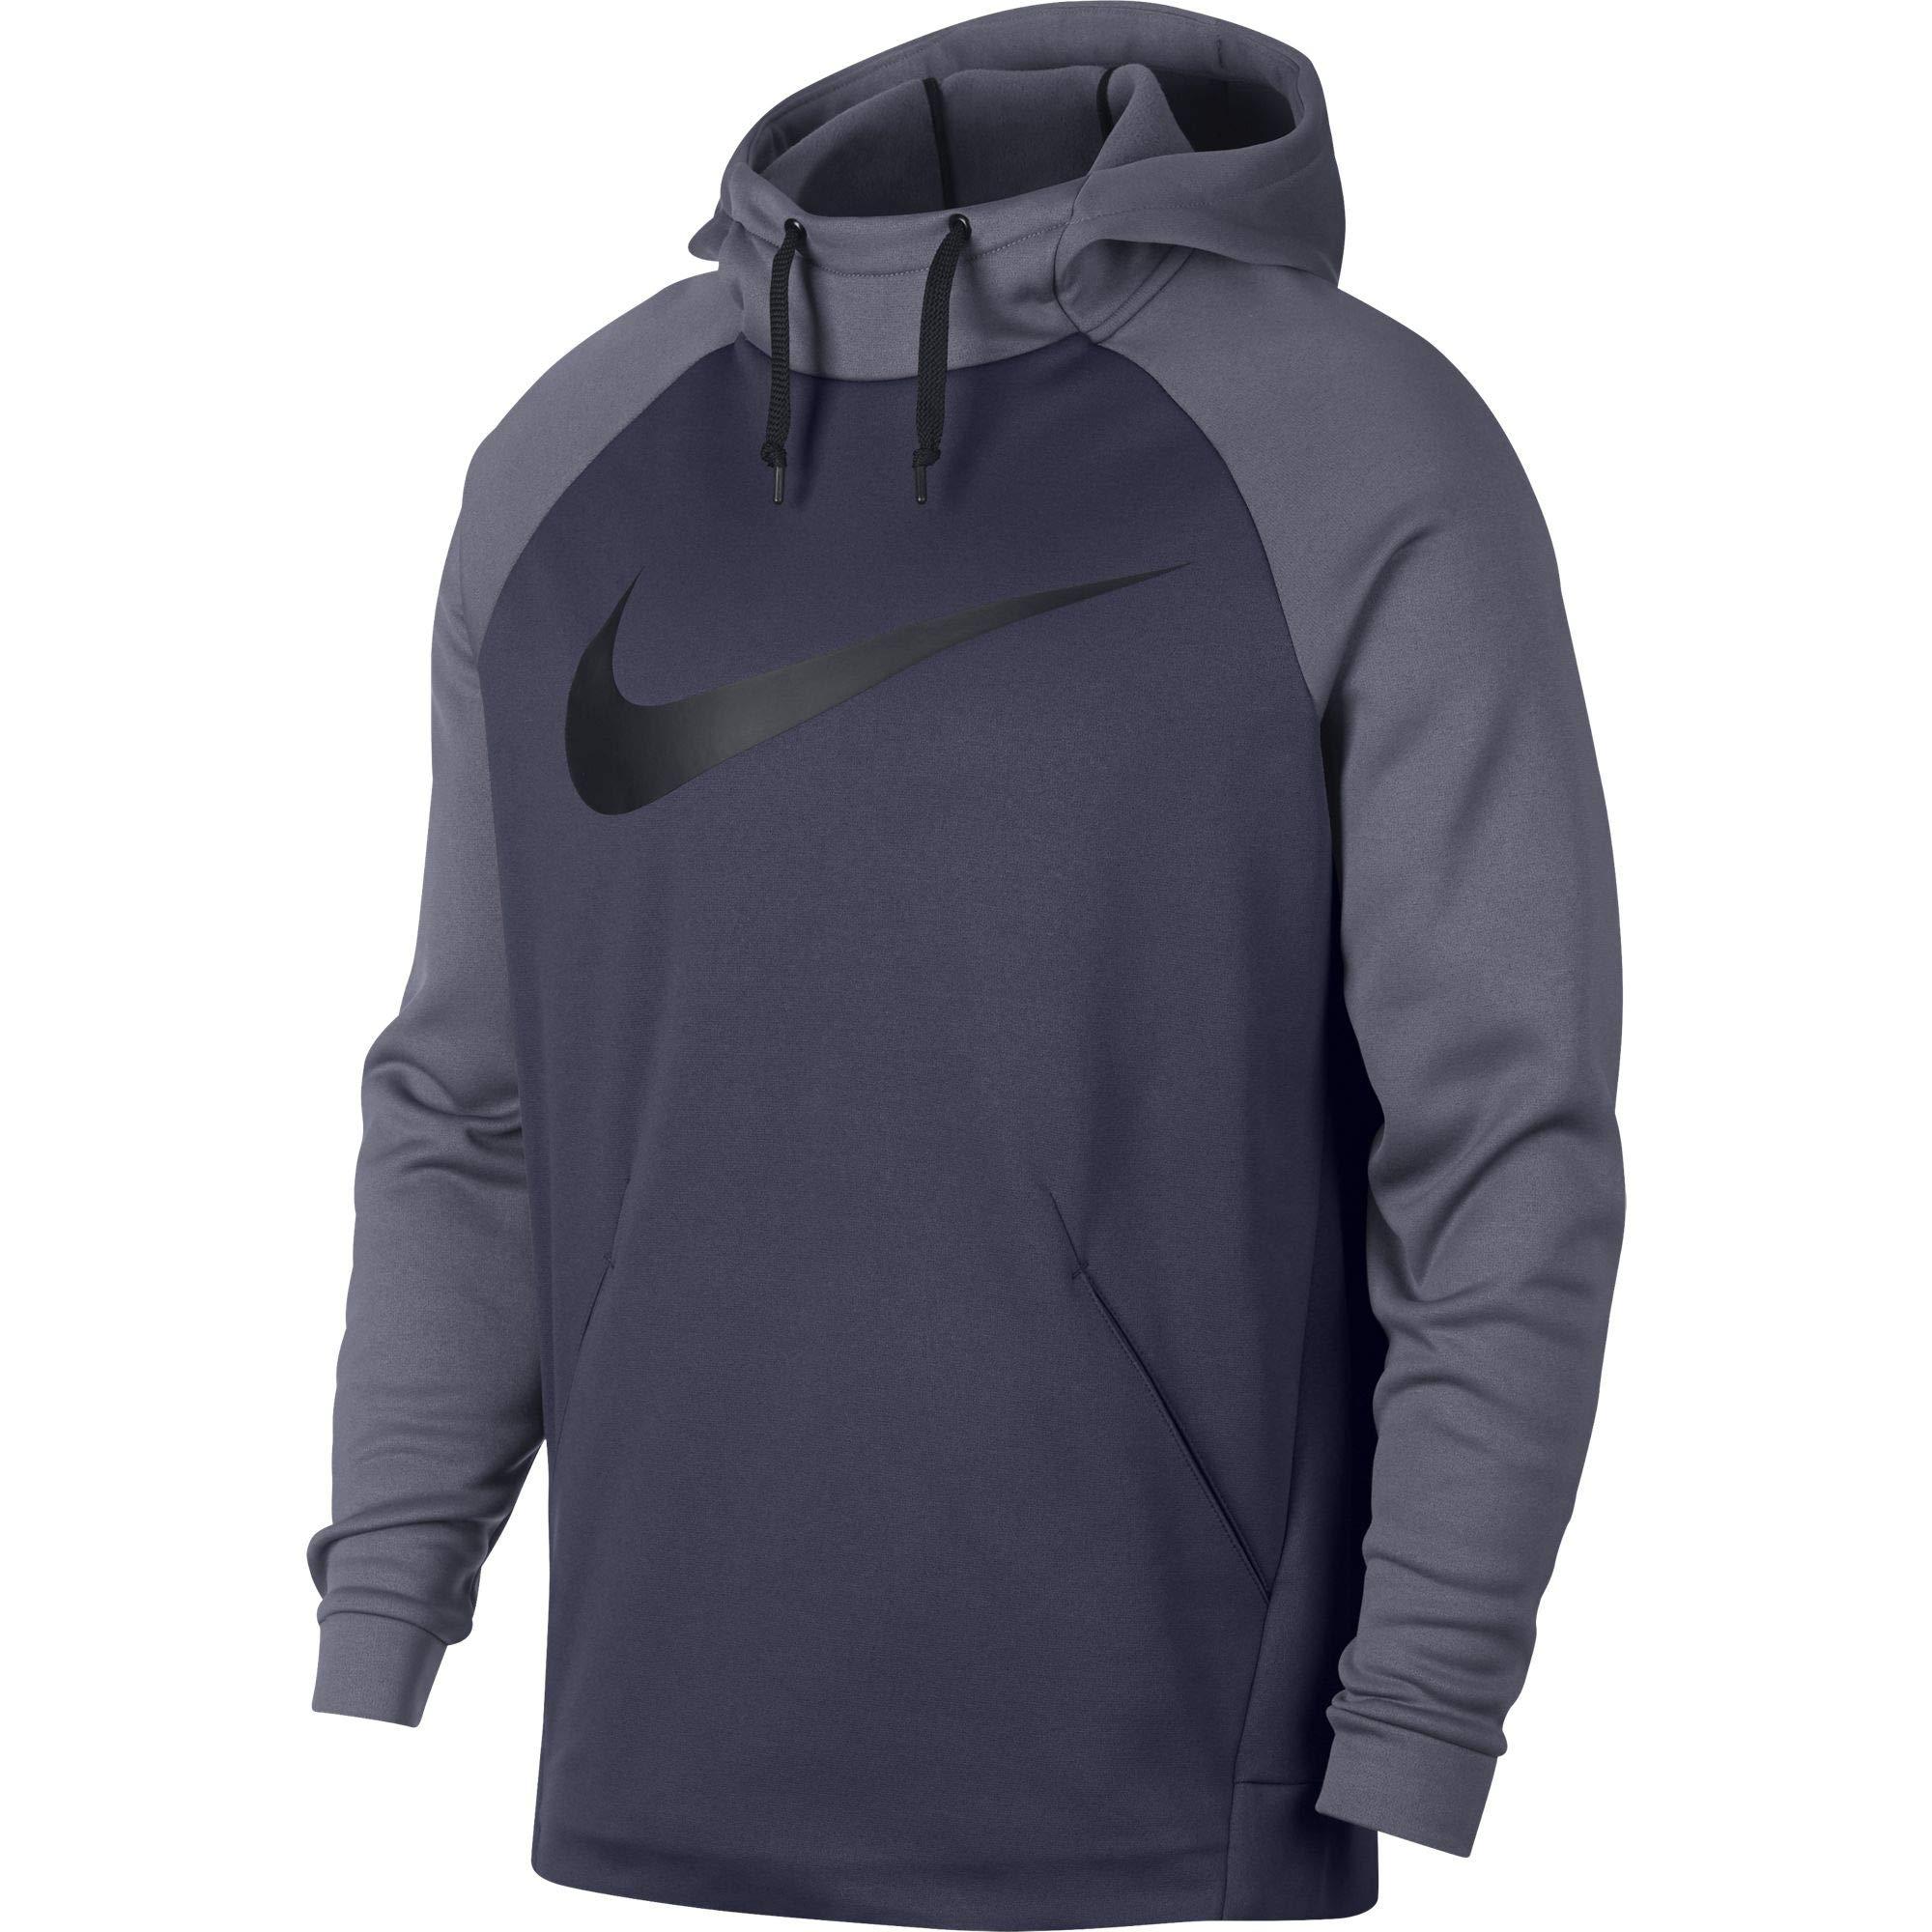 Nike Men's Therma Swoosh Training Hoodie Thunder Blue/Light Carbon/Black Size Small